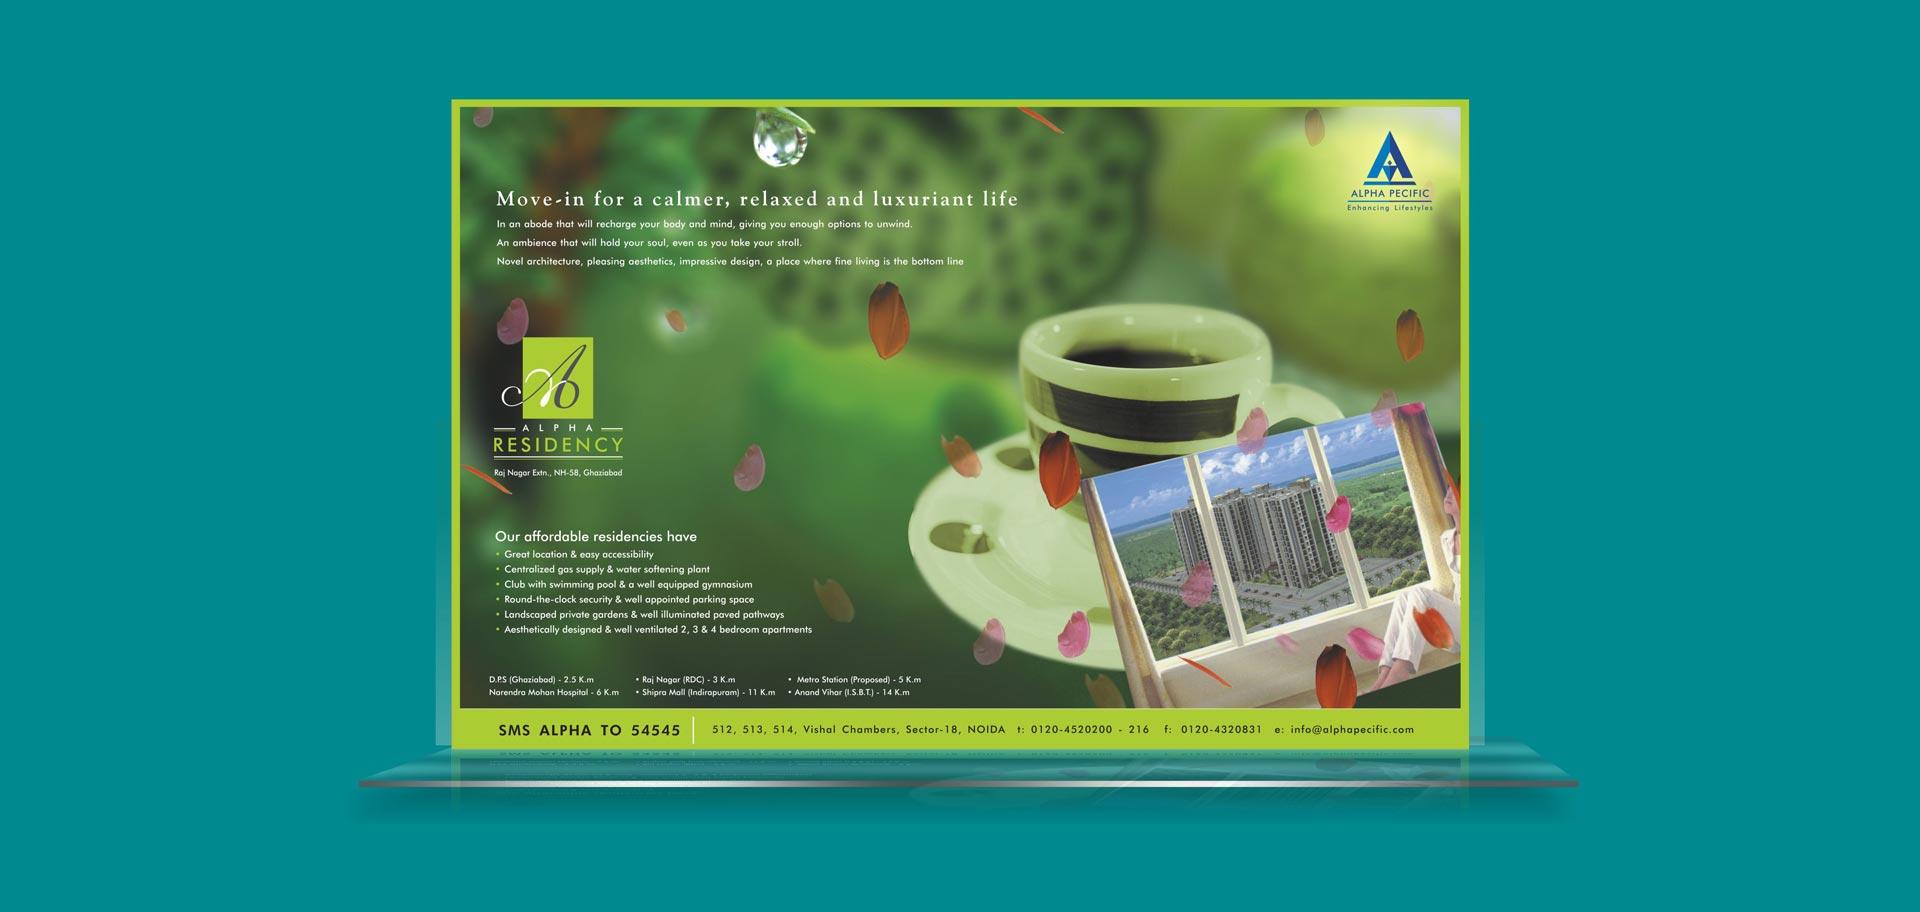 alpha-residency-advertisement